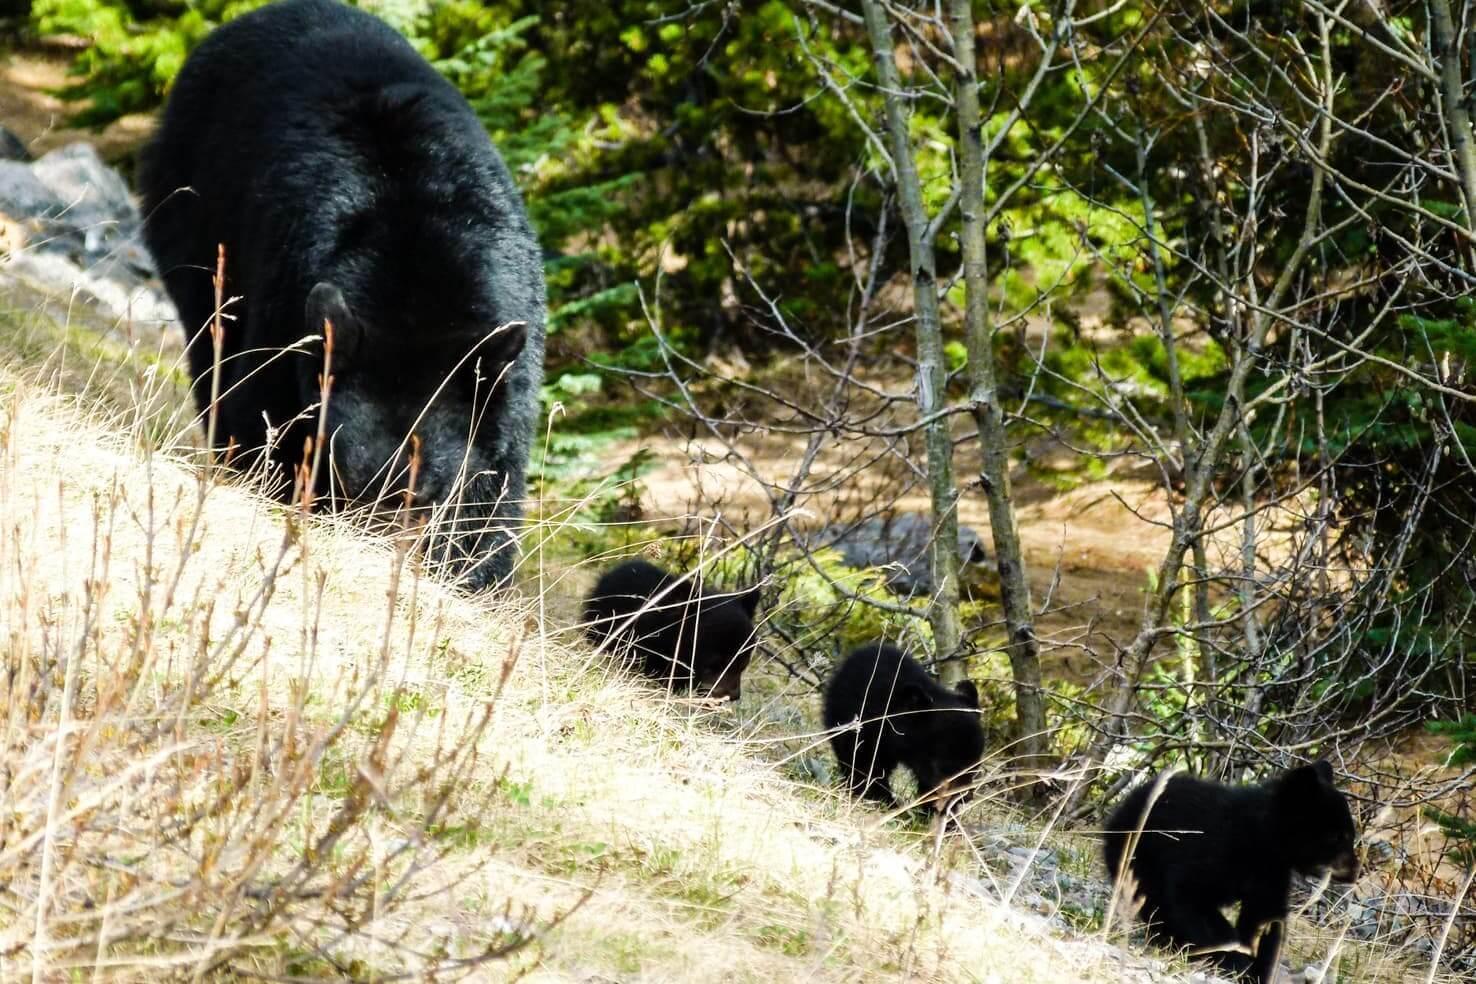 black bears in the wild